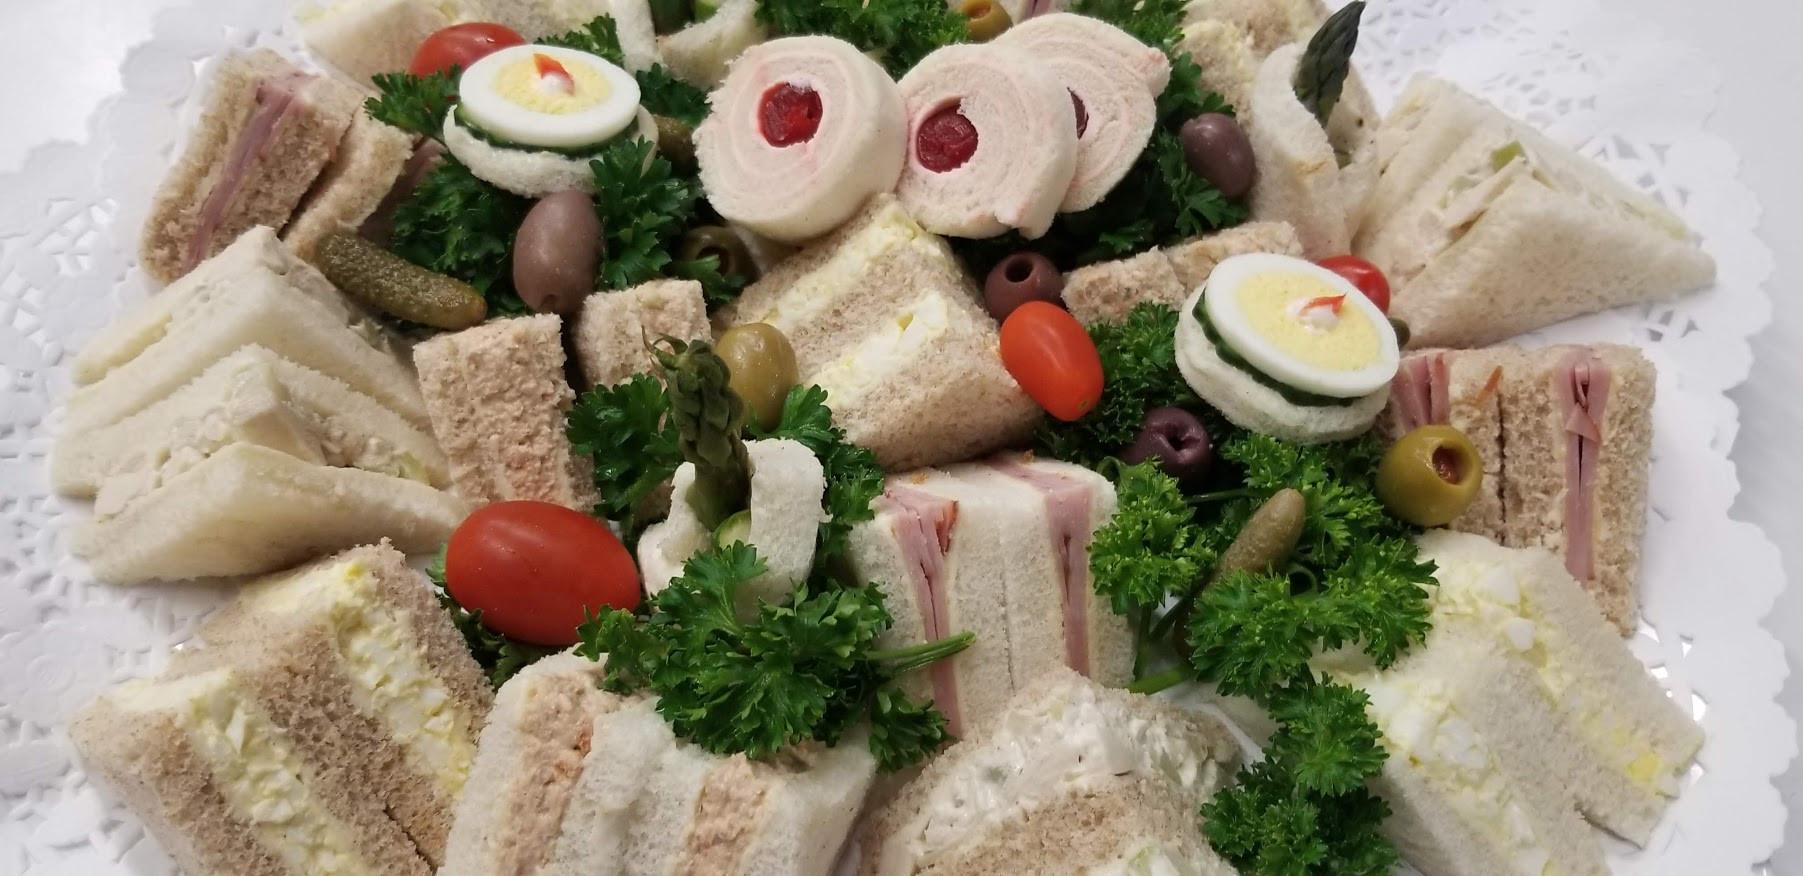 Party Sandwiches